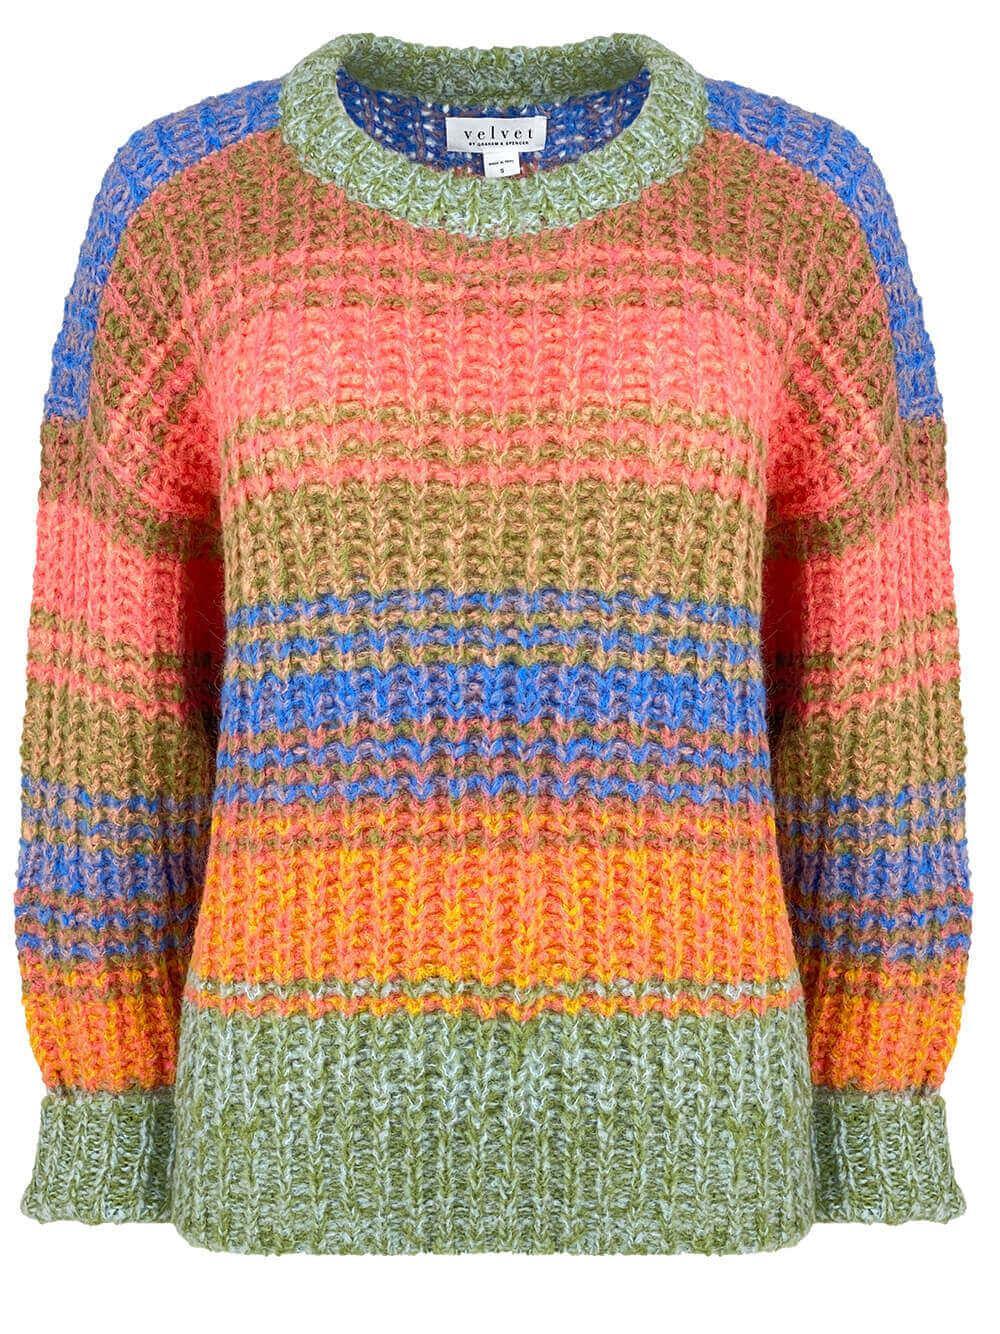 Raven Striped Sweater Item # RAVEN05